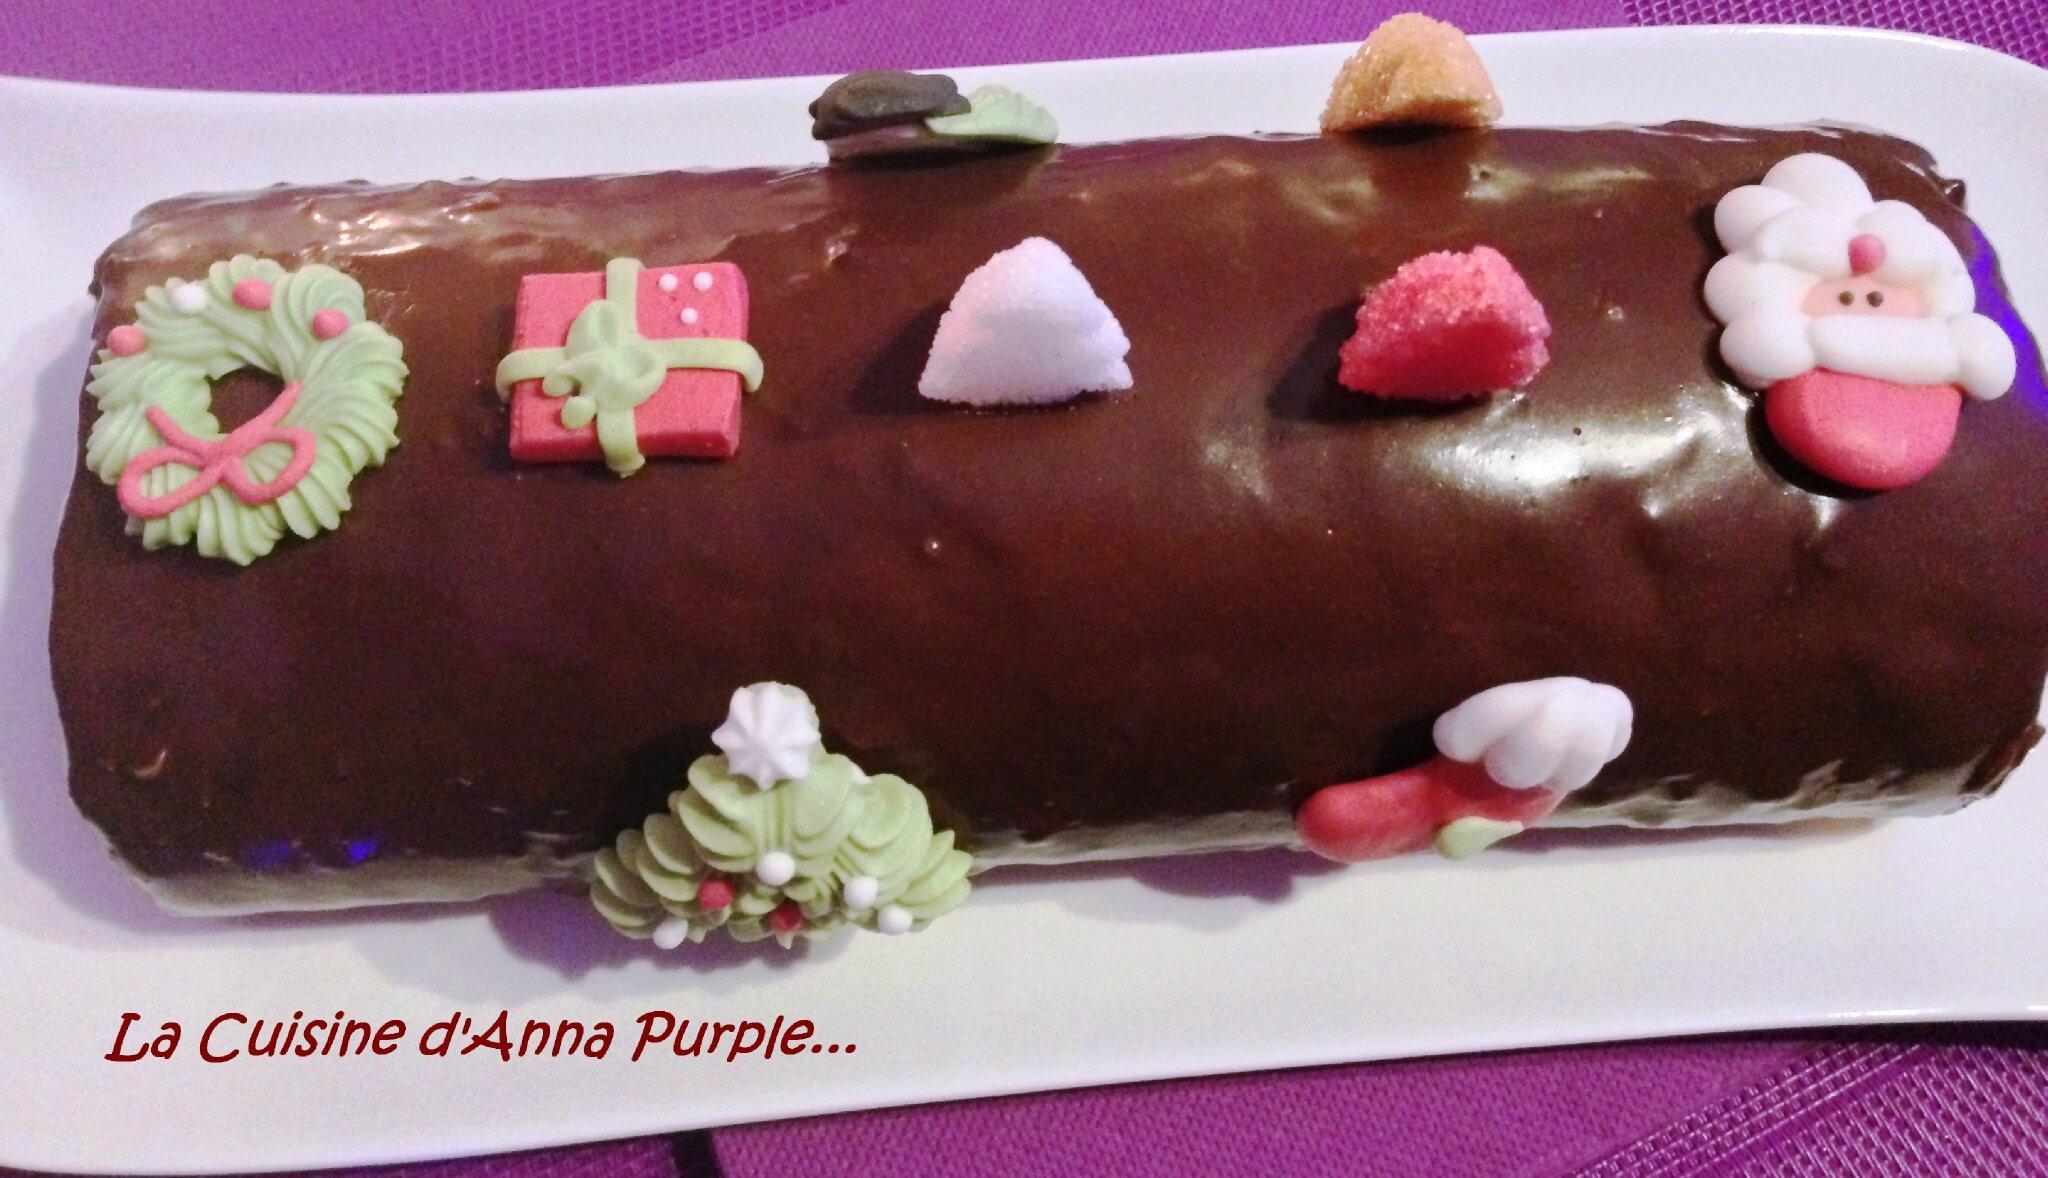 BUCHE CHOCOLAT PRALINE CROQUANTE 1 - LA CUISINE DANNA PURPLE